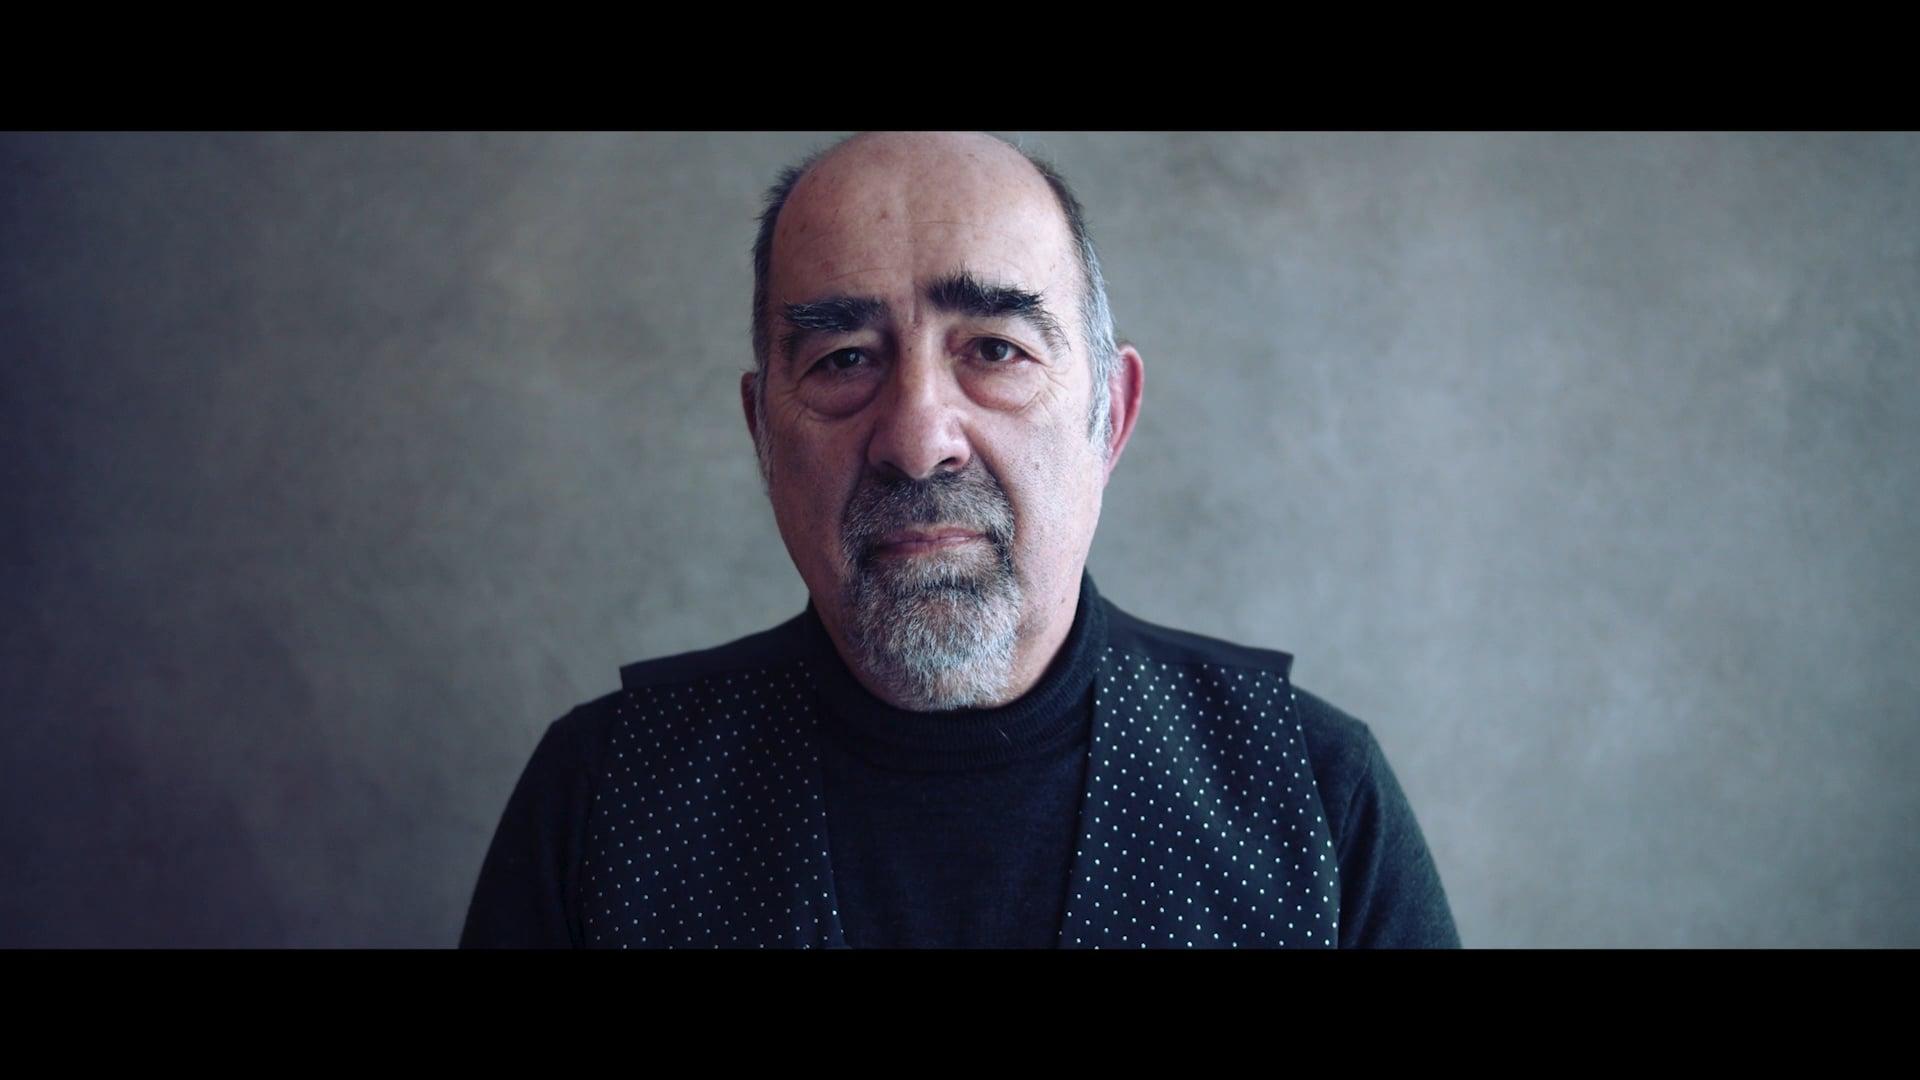 A Portrait of a Photographer   Teaser